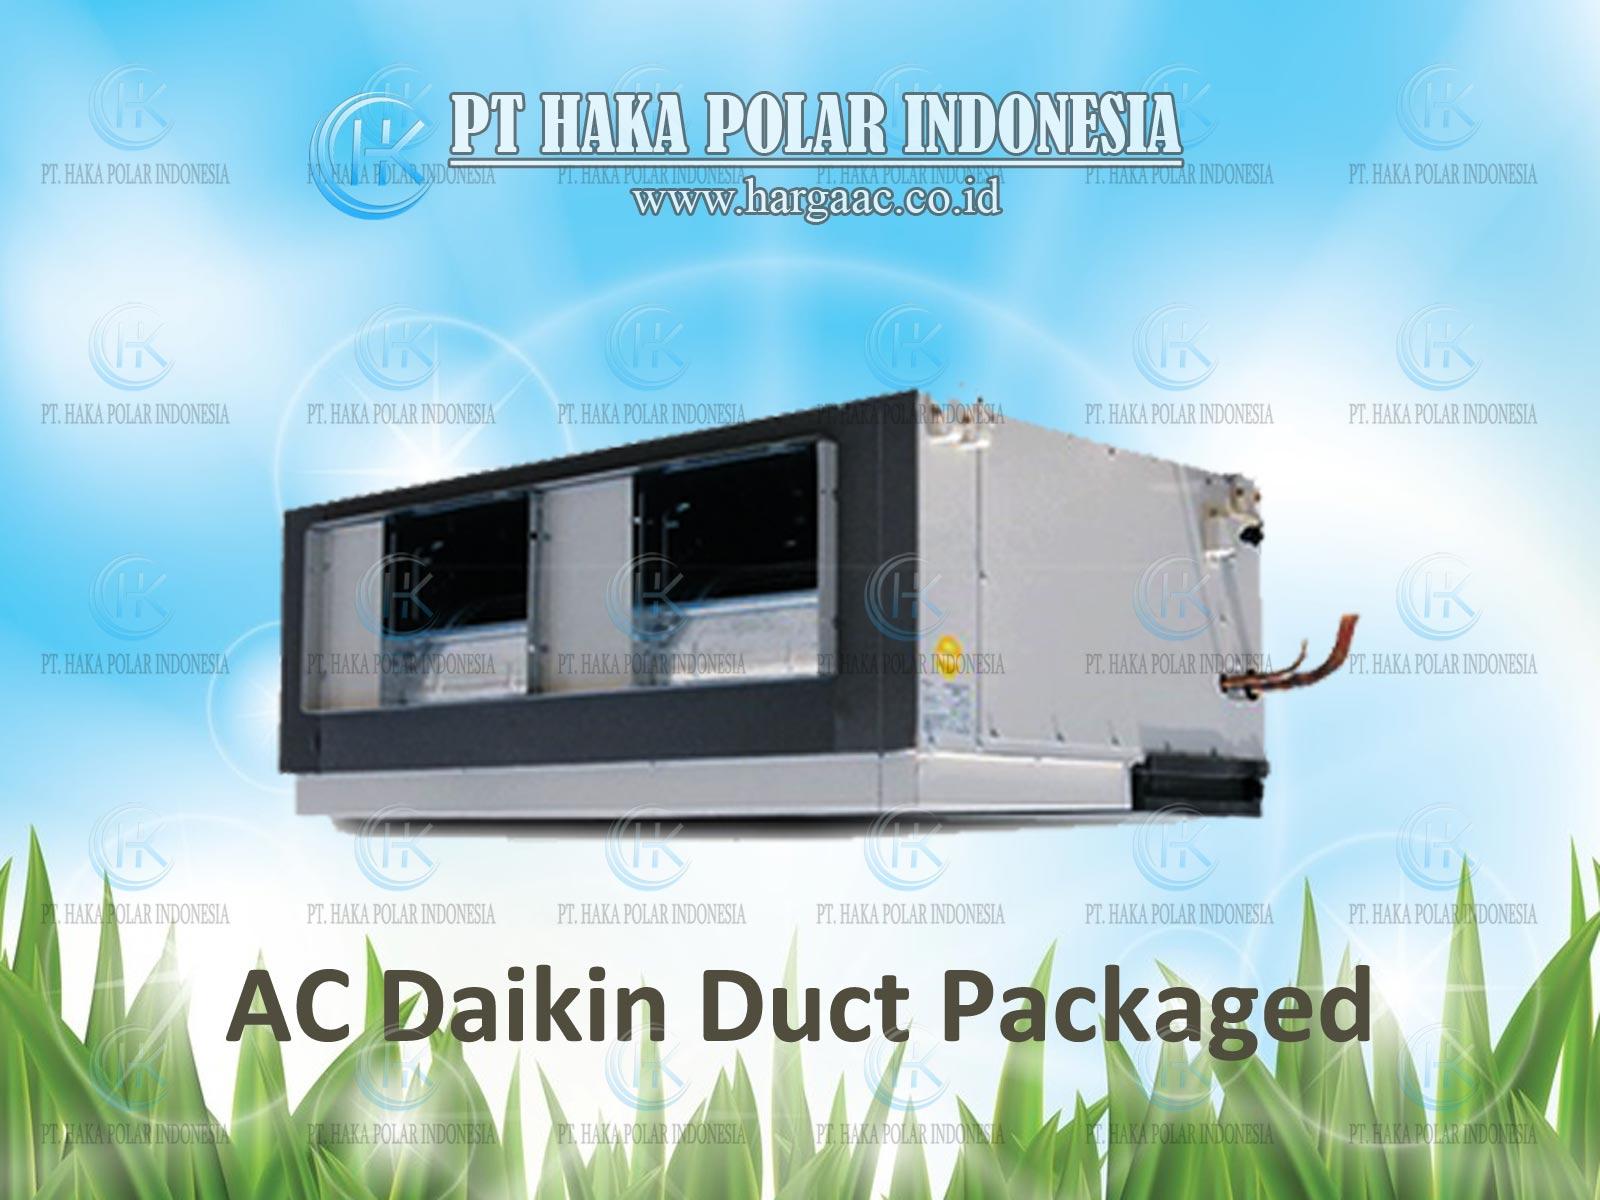 Jual AC Daikin Duct Packaged